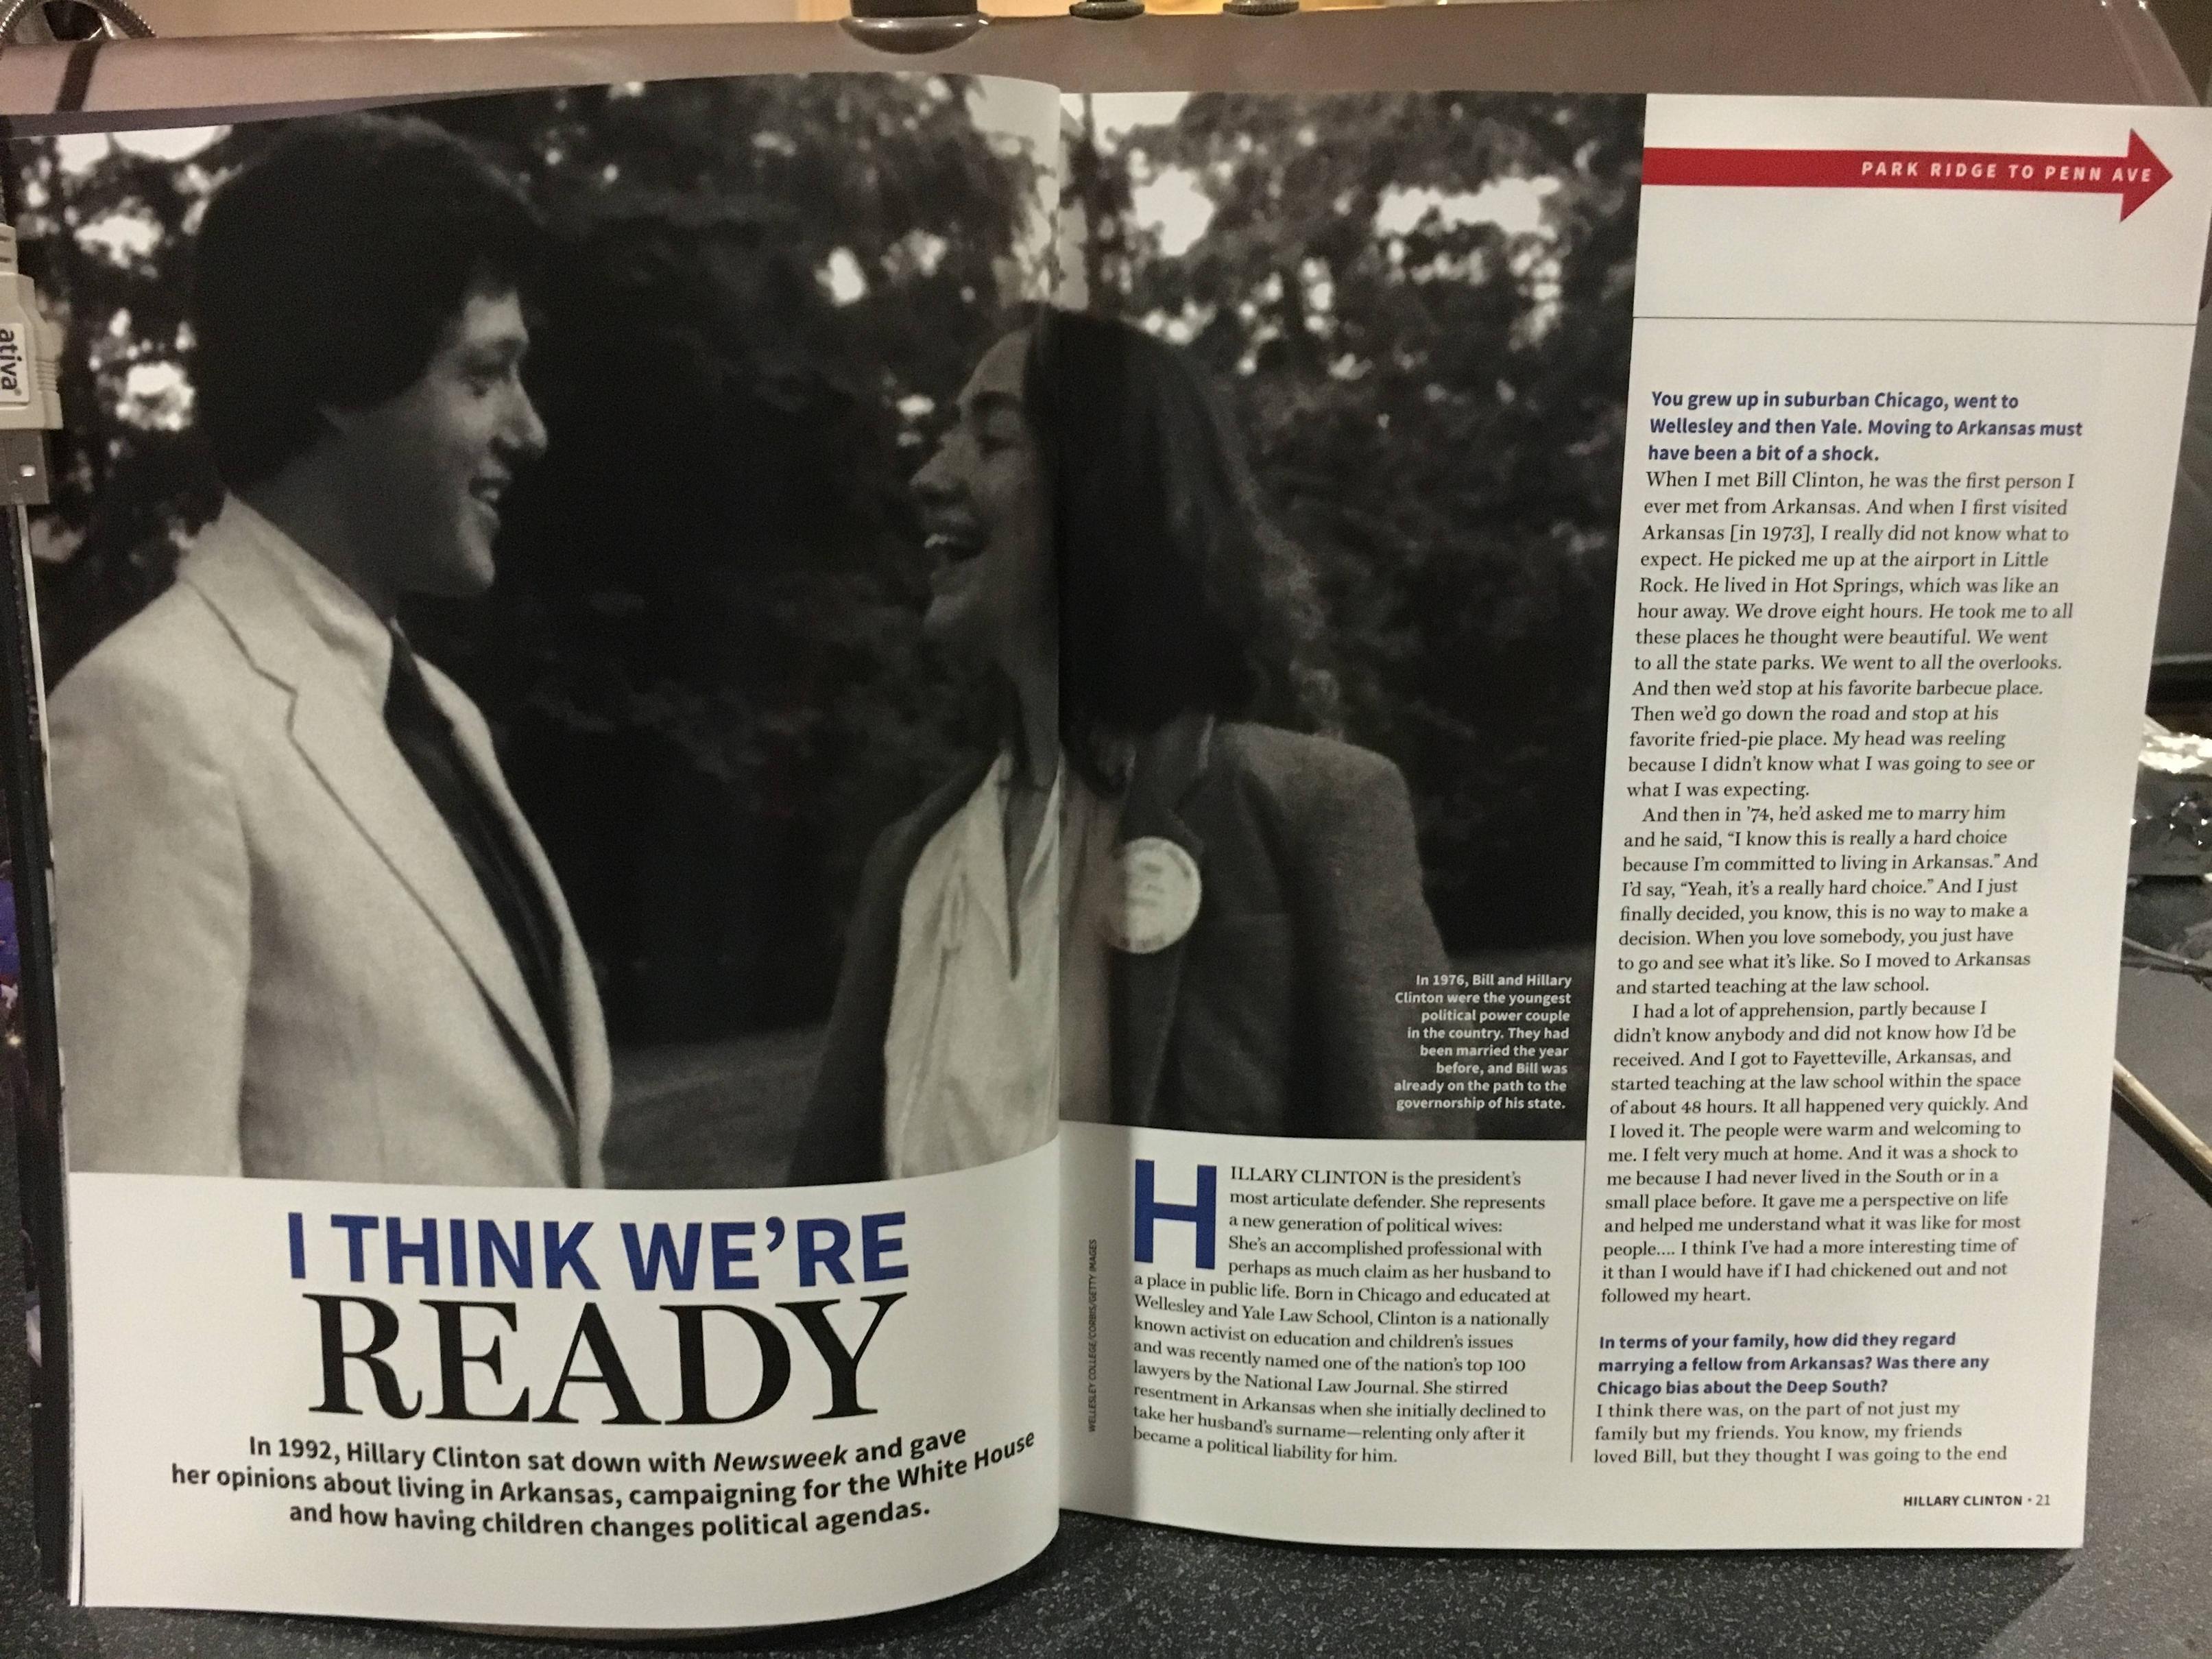 newsweek-madame-hillary-clinton-page-10